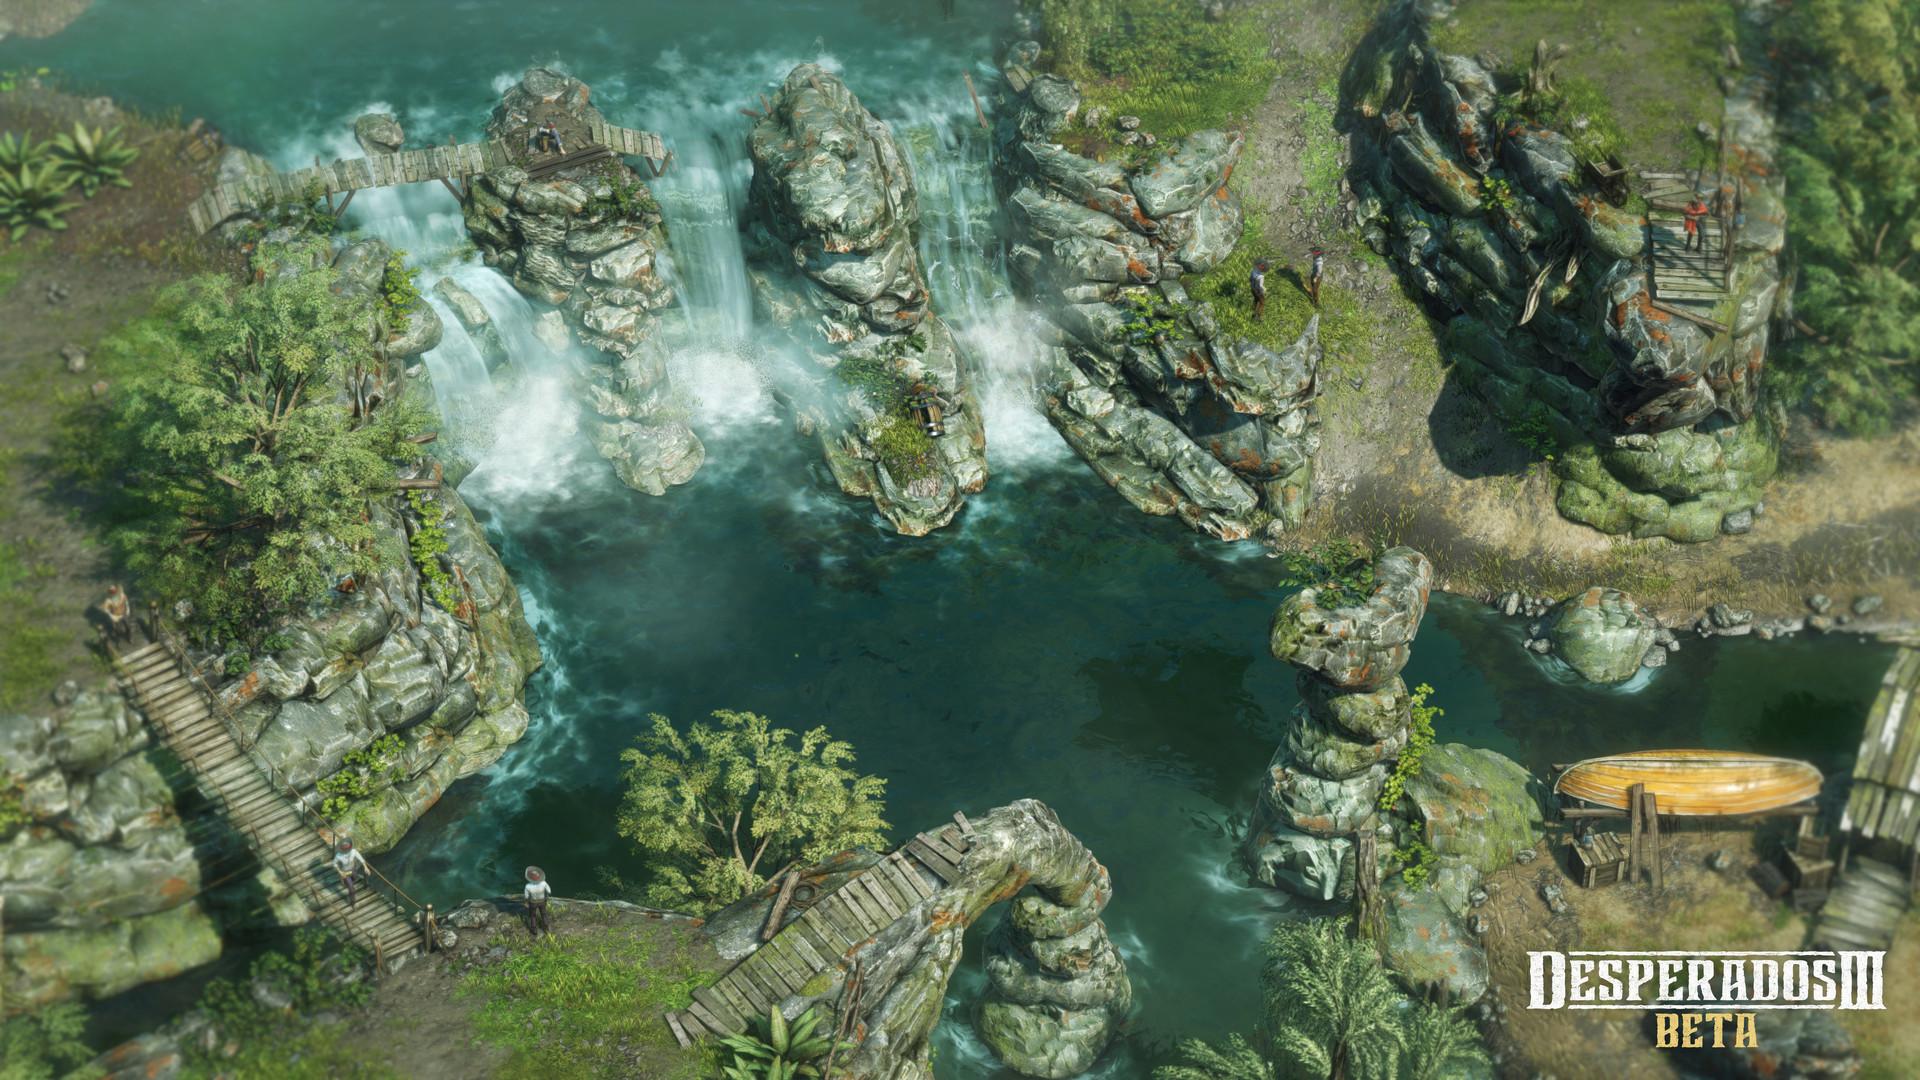 Desperados III on Steam